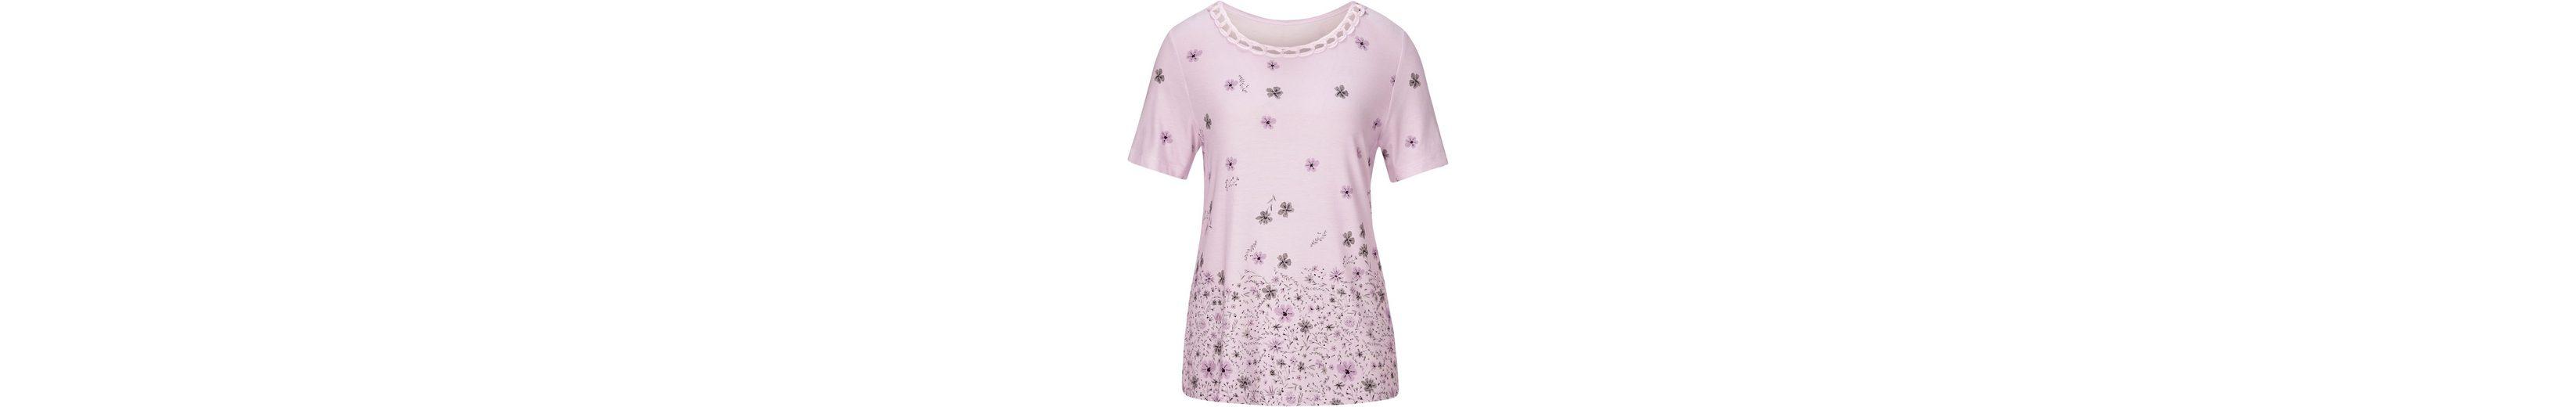 Fair Lady Shirt Shirt aus weicher Viskose-Stretch-Qualität Rabatt Besuch E3uMD6